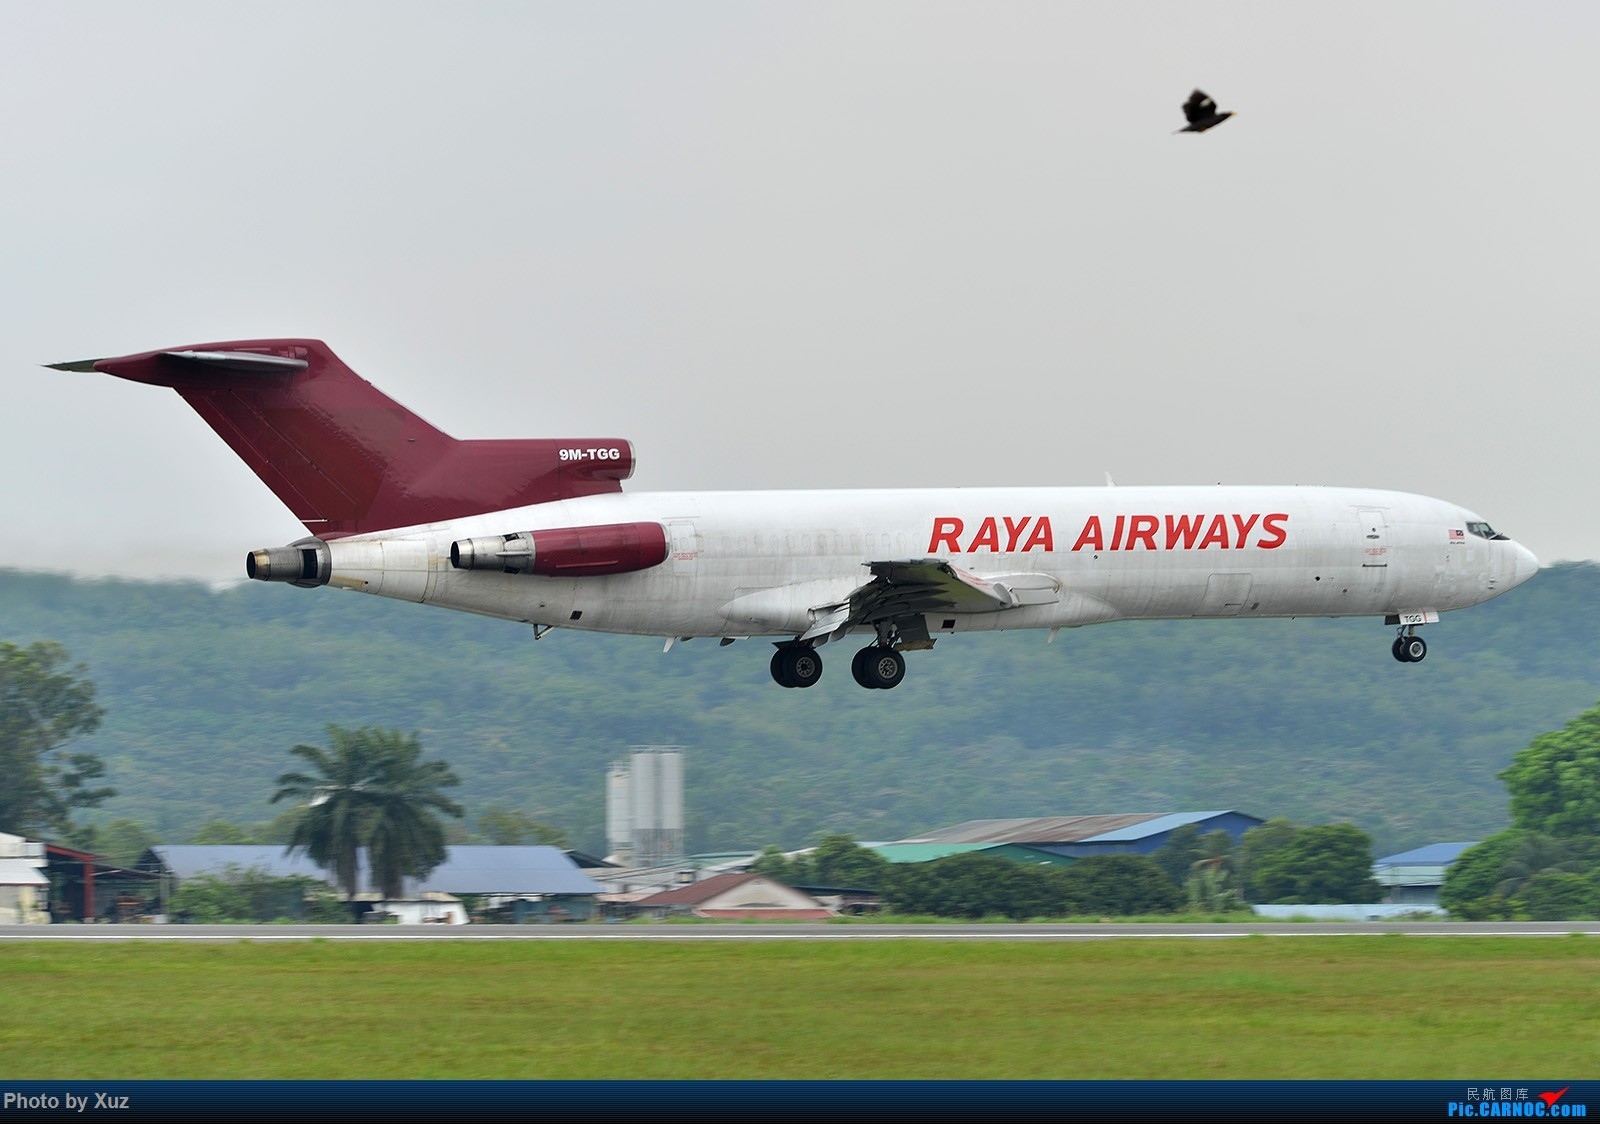 Re:[原创]三月LIMA行逮到几架现在少有的机型 BOEING 727-200 9M-TGG 马来西亚吉隆坡苏丹阿卜杜尔机场